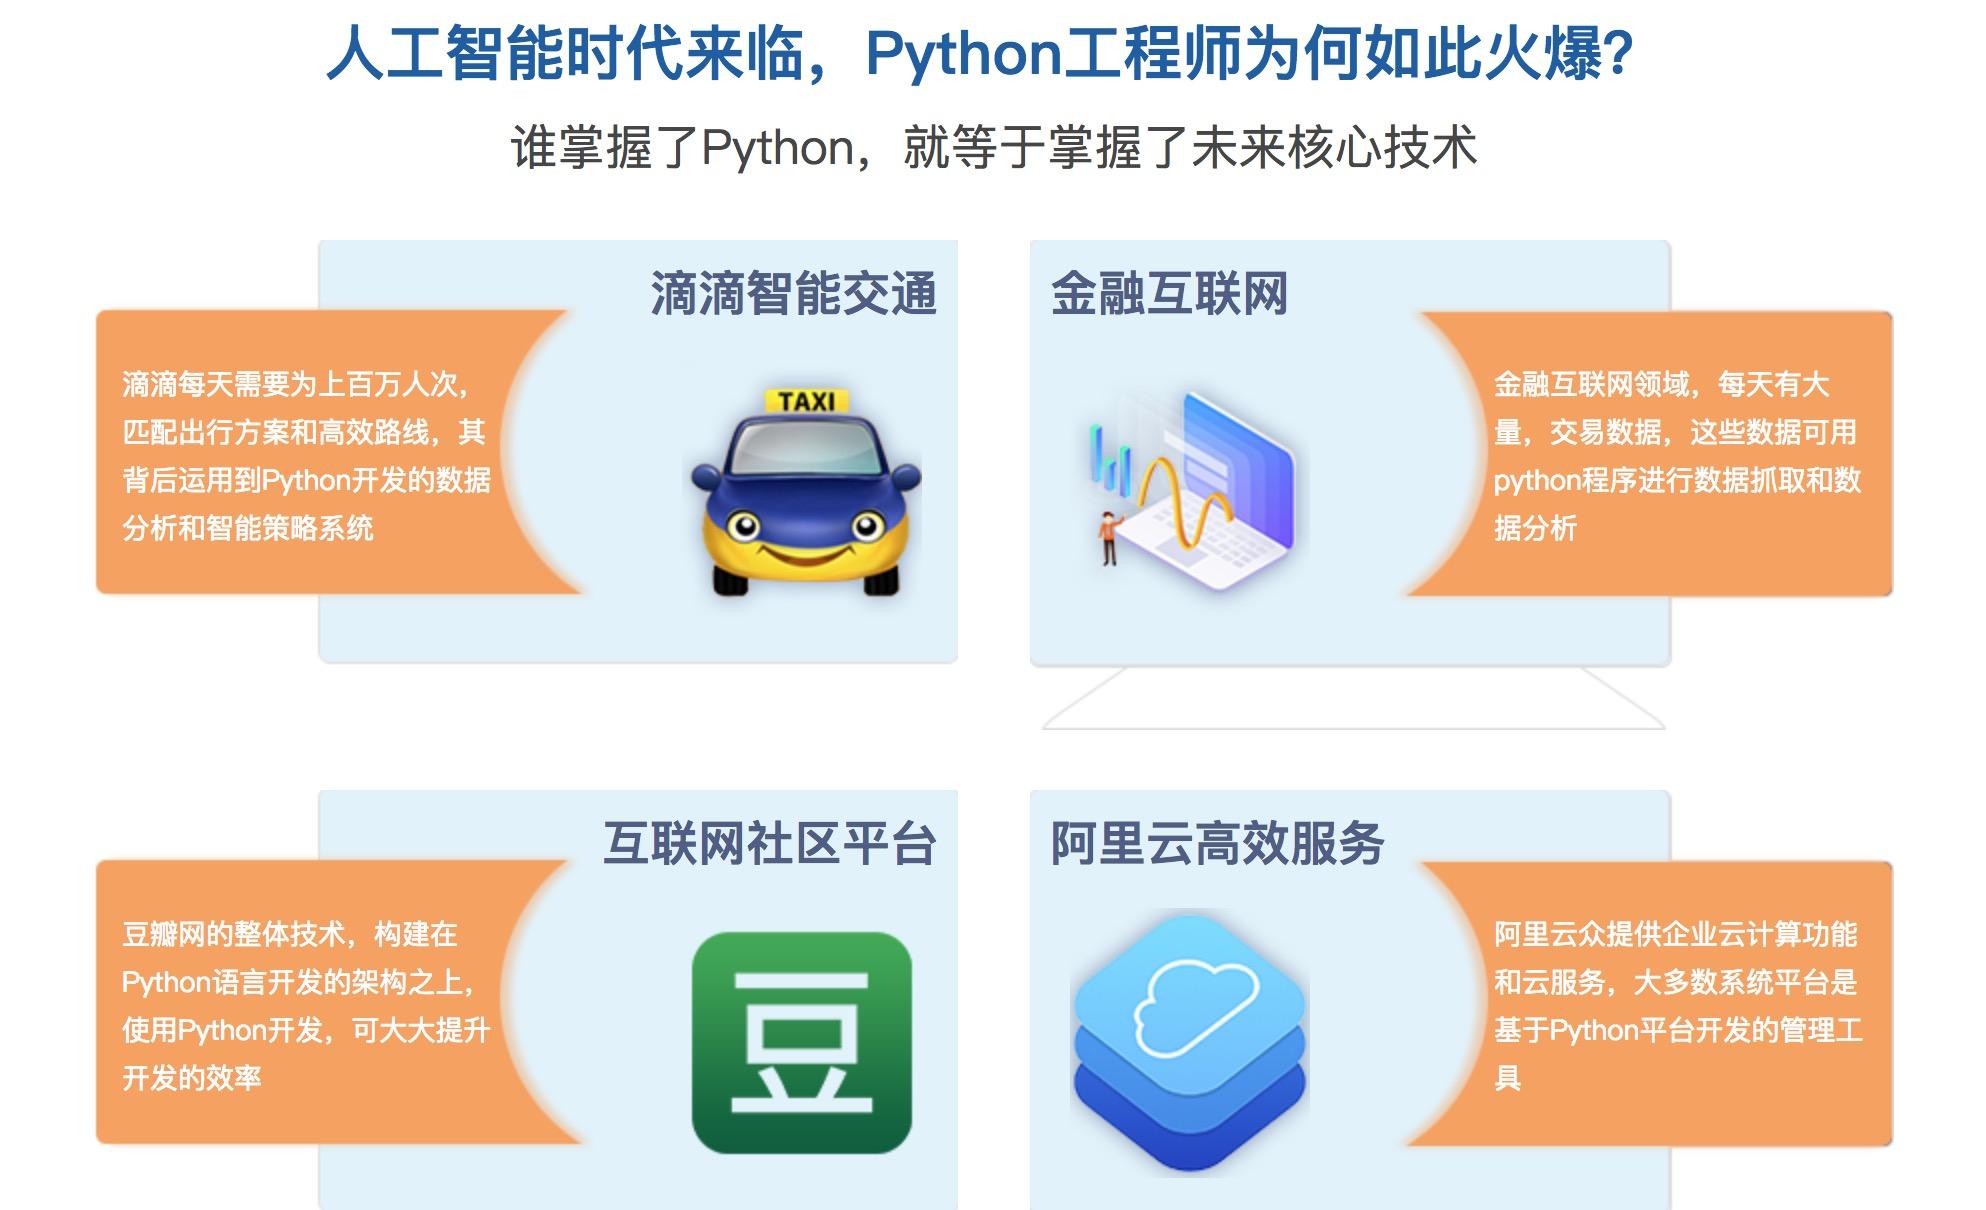 python培训哪个机构好?阿里python工程师帮你把关